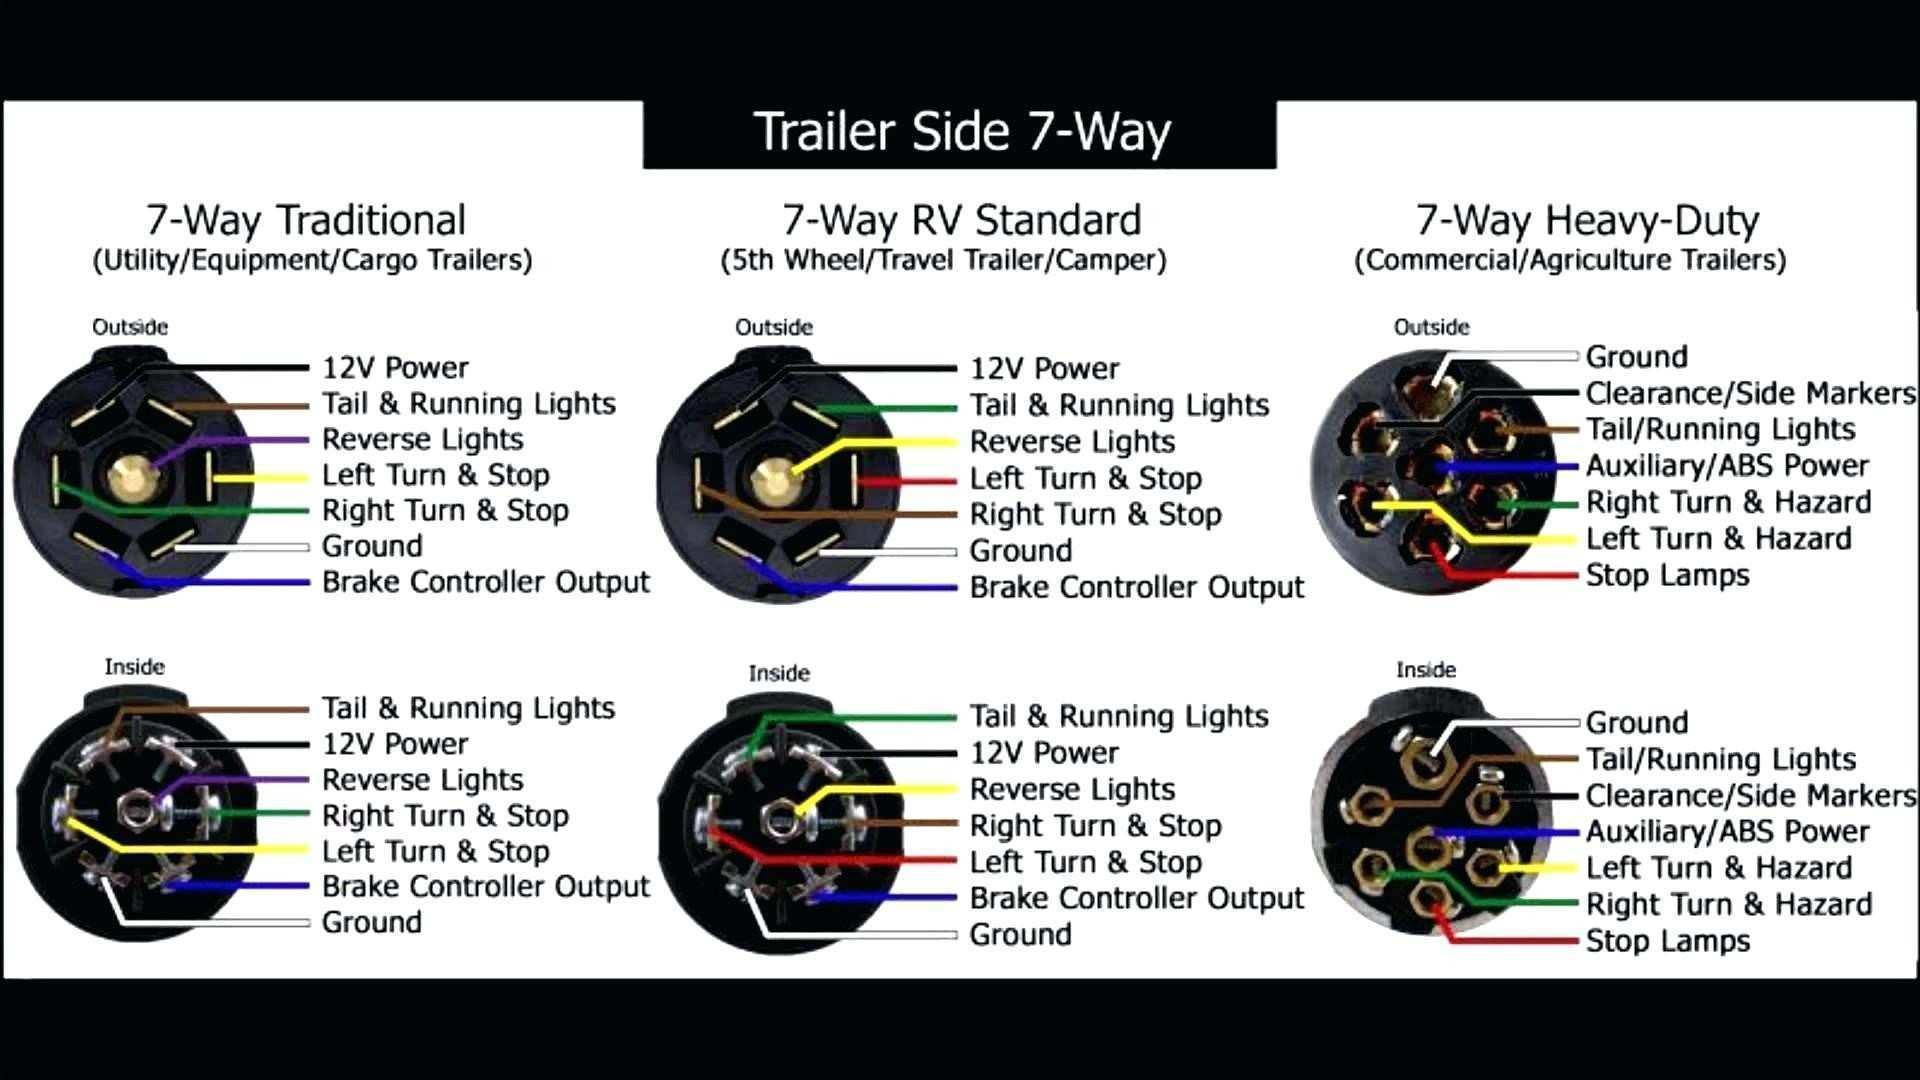 2007 Chevy Trailer Wiring Diagram